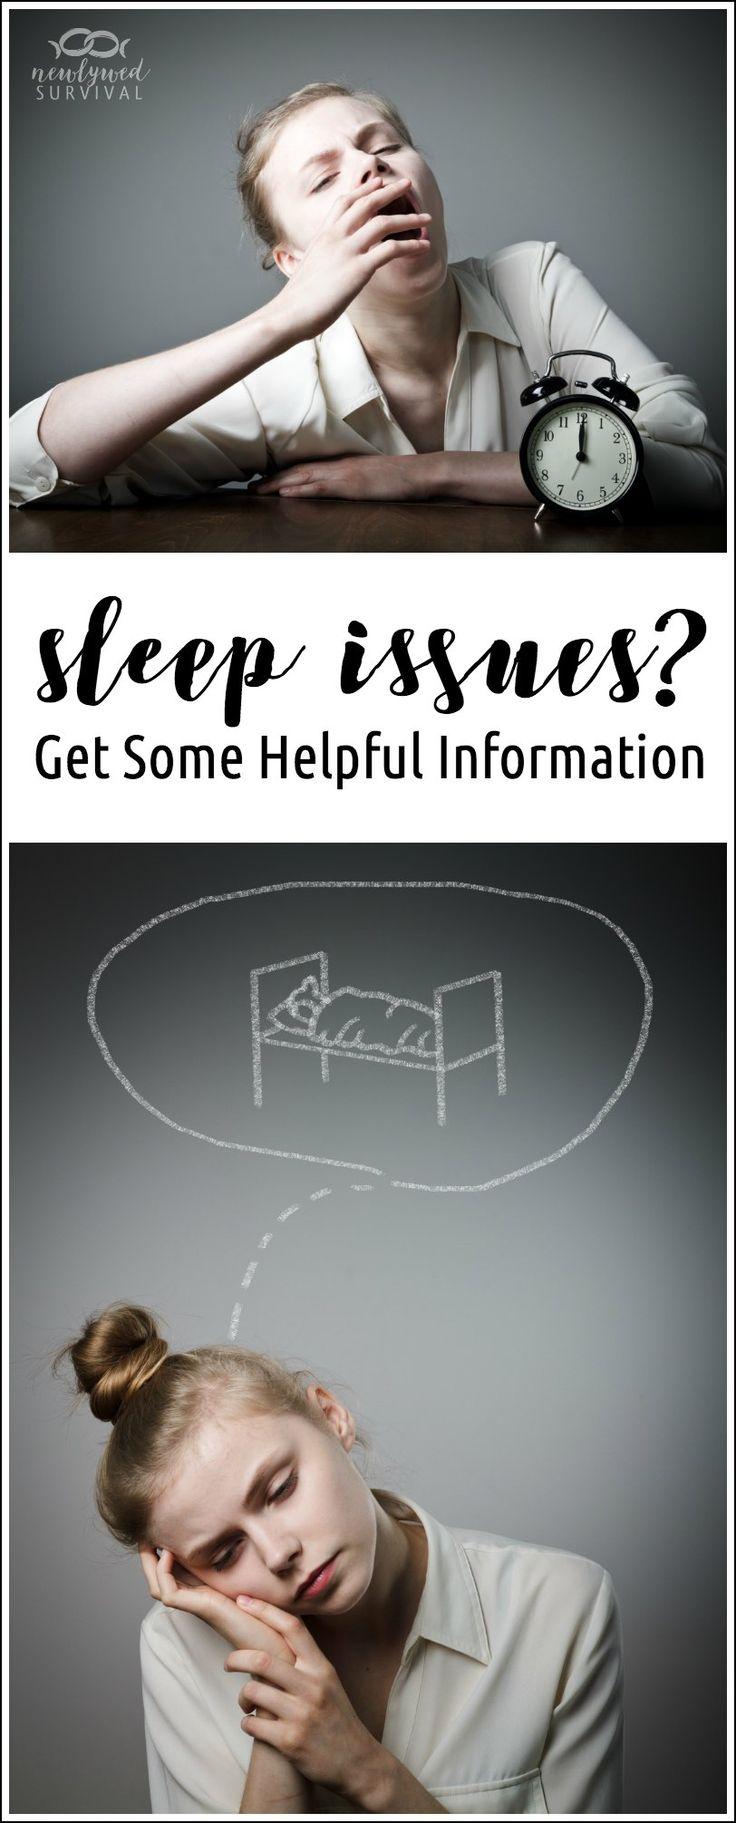 Great resources here!! - Having Sleep Issues? Get Some Helpful Information #BeyondTired via @newlywedsurvive